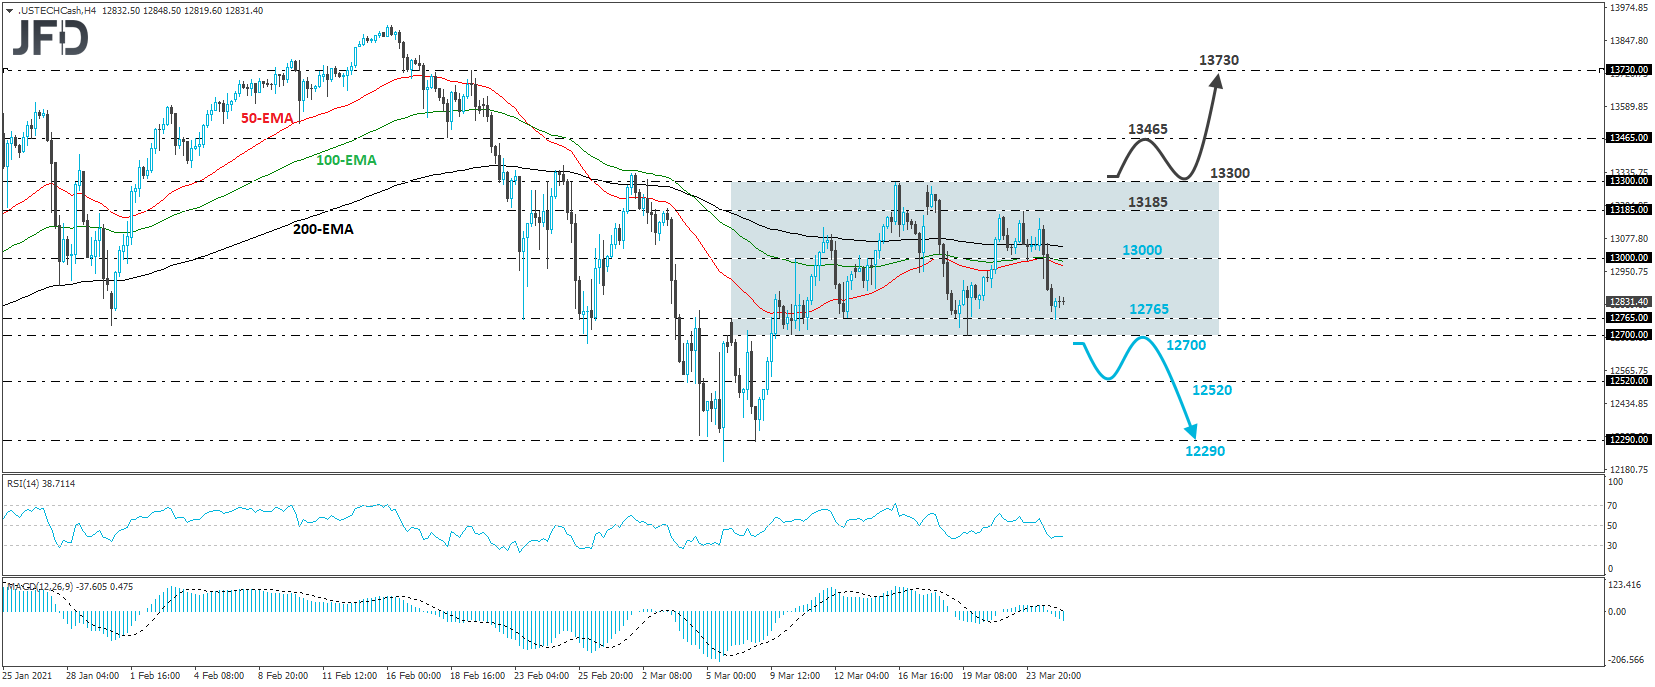 Nasdaq 100 4-hour chart technical analysis